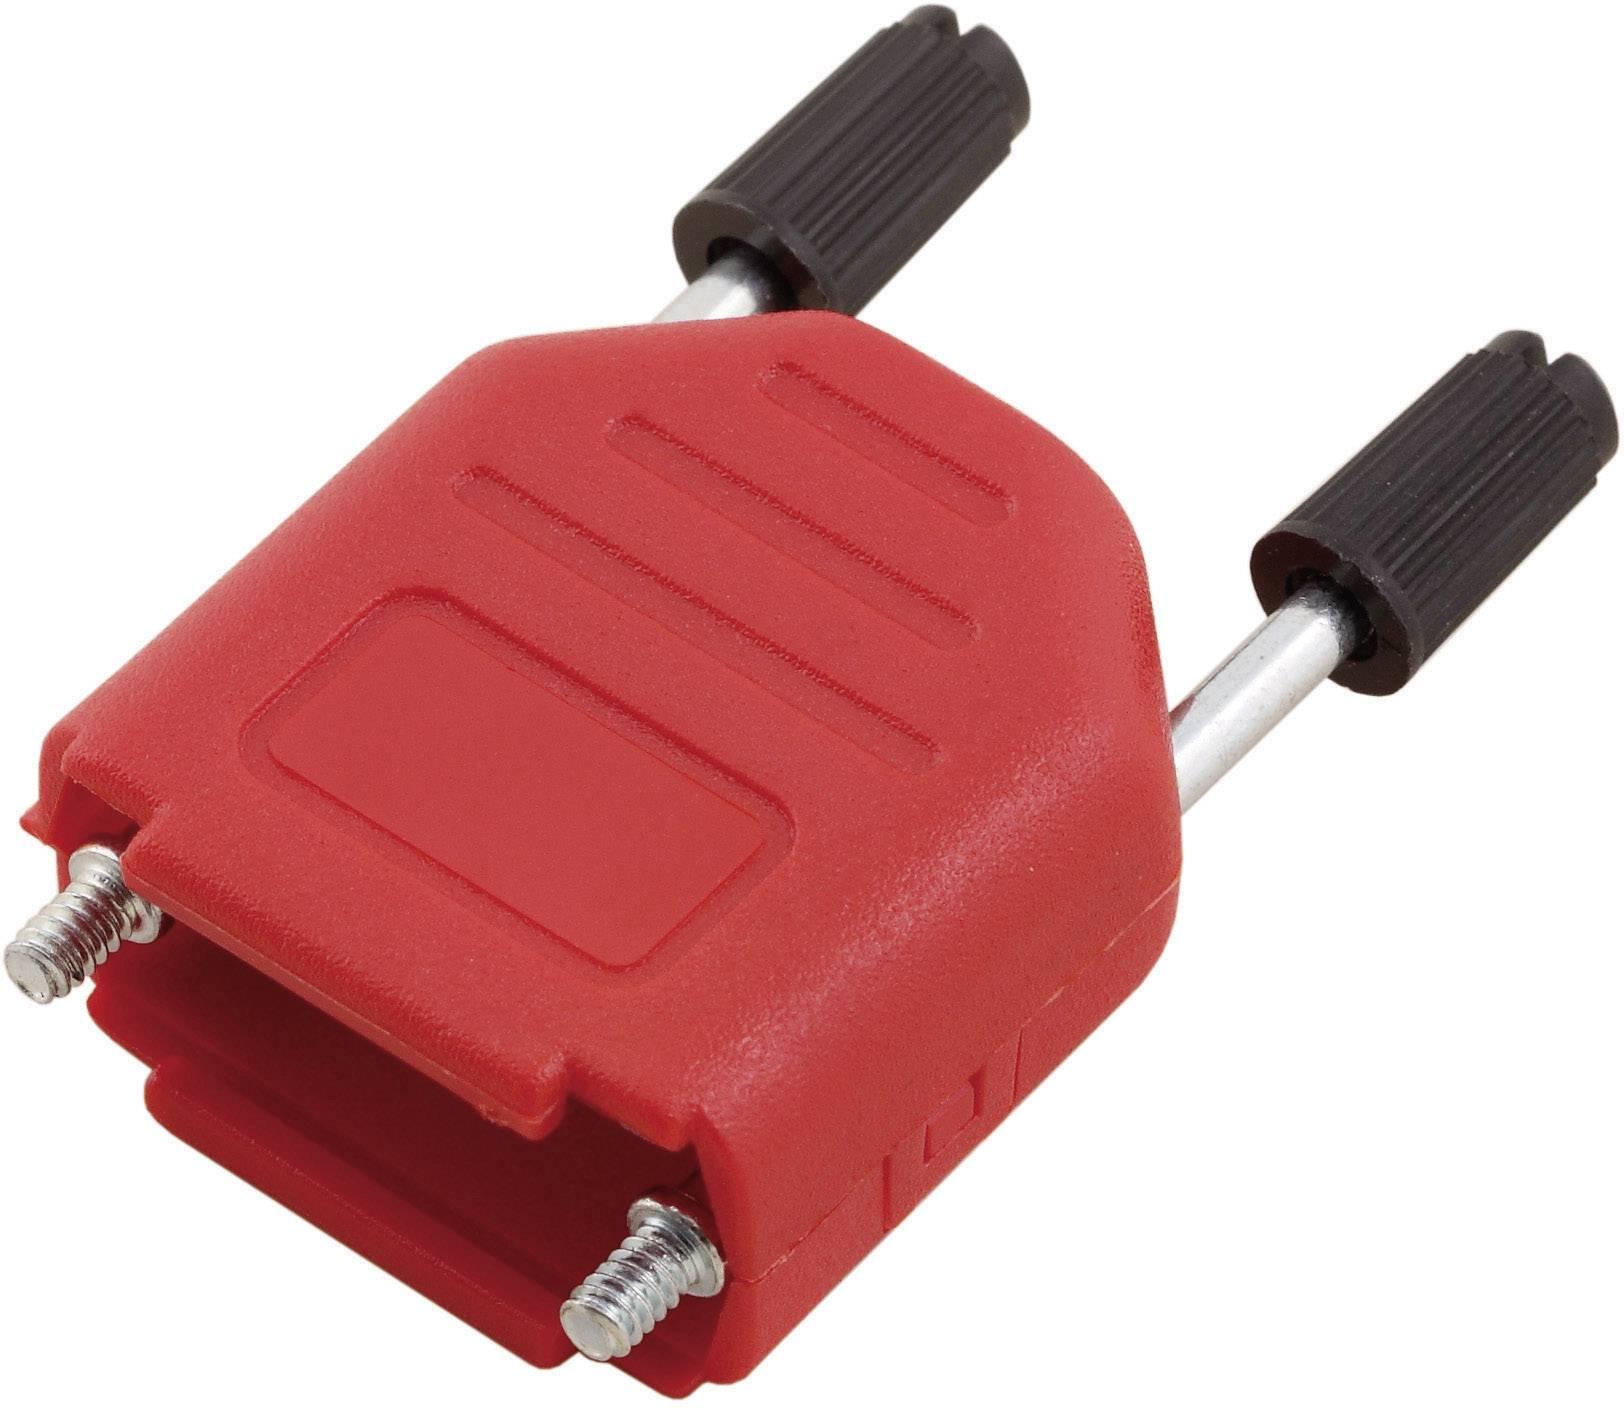 D-SUB púzdro MH Connectors MHDPPK25-R-K 6353-0103-03, Počet pinov: 25, plast, 180 °, červená, 1 ks